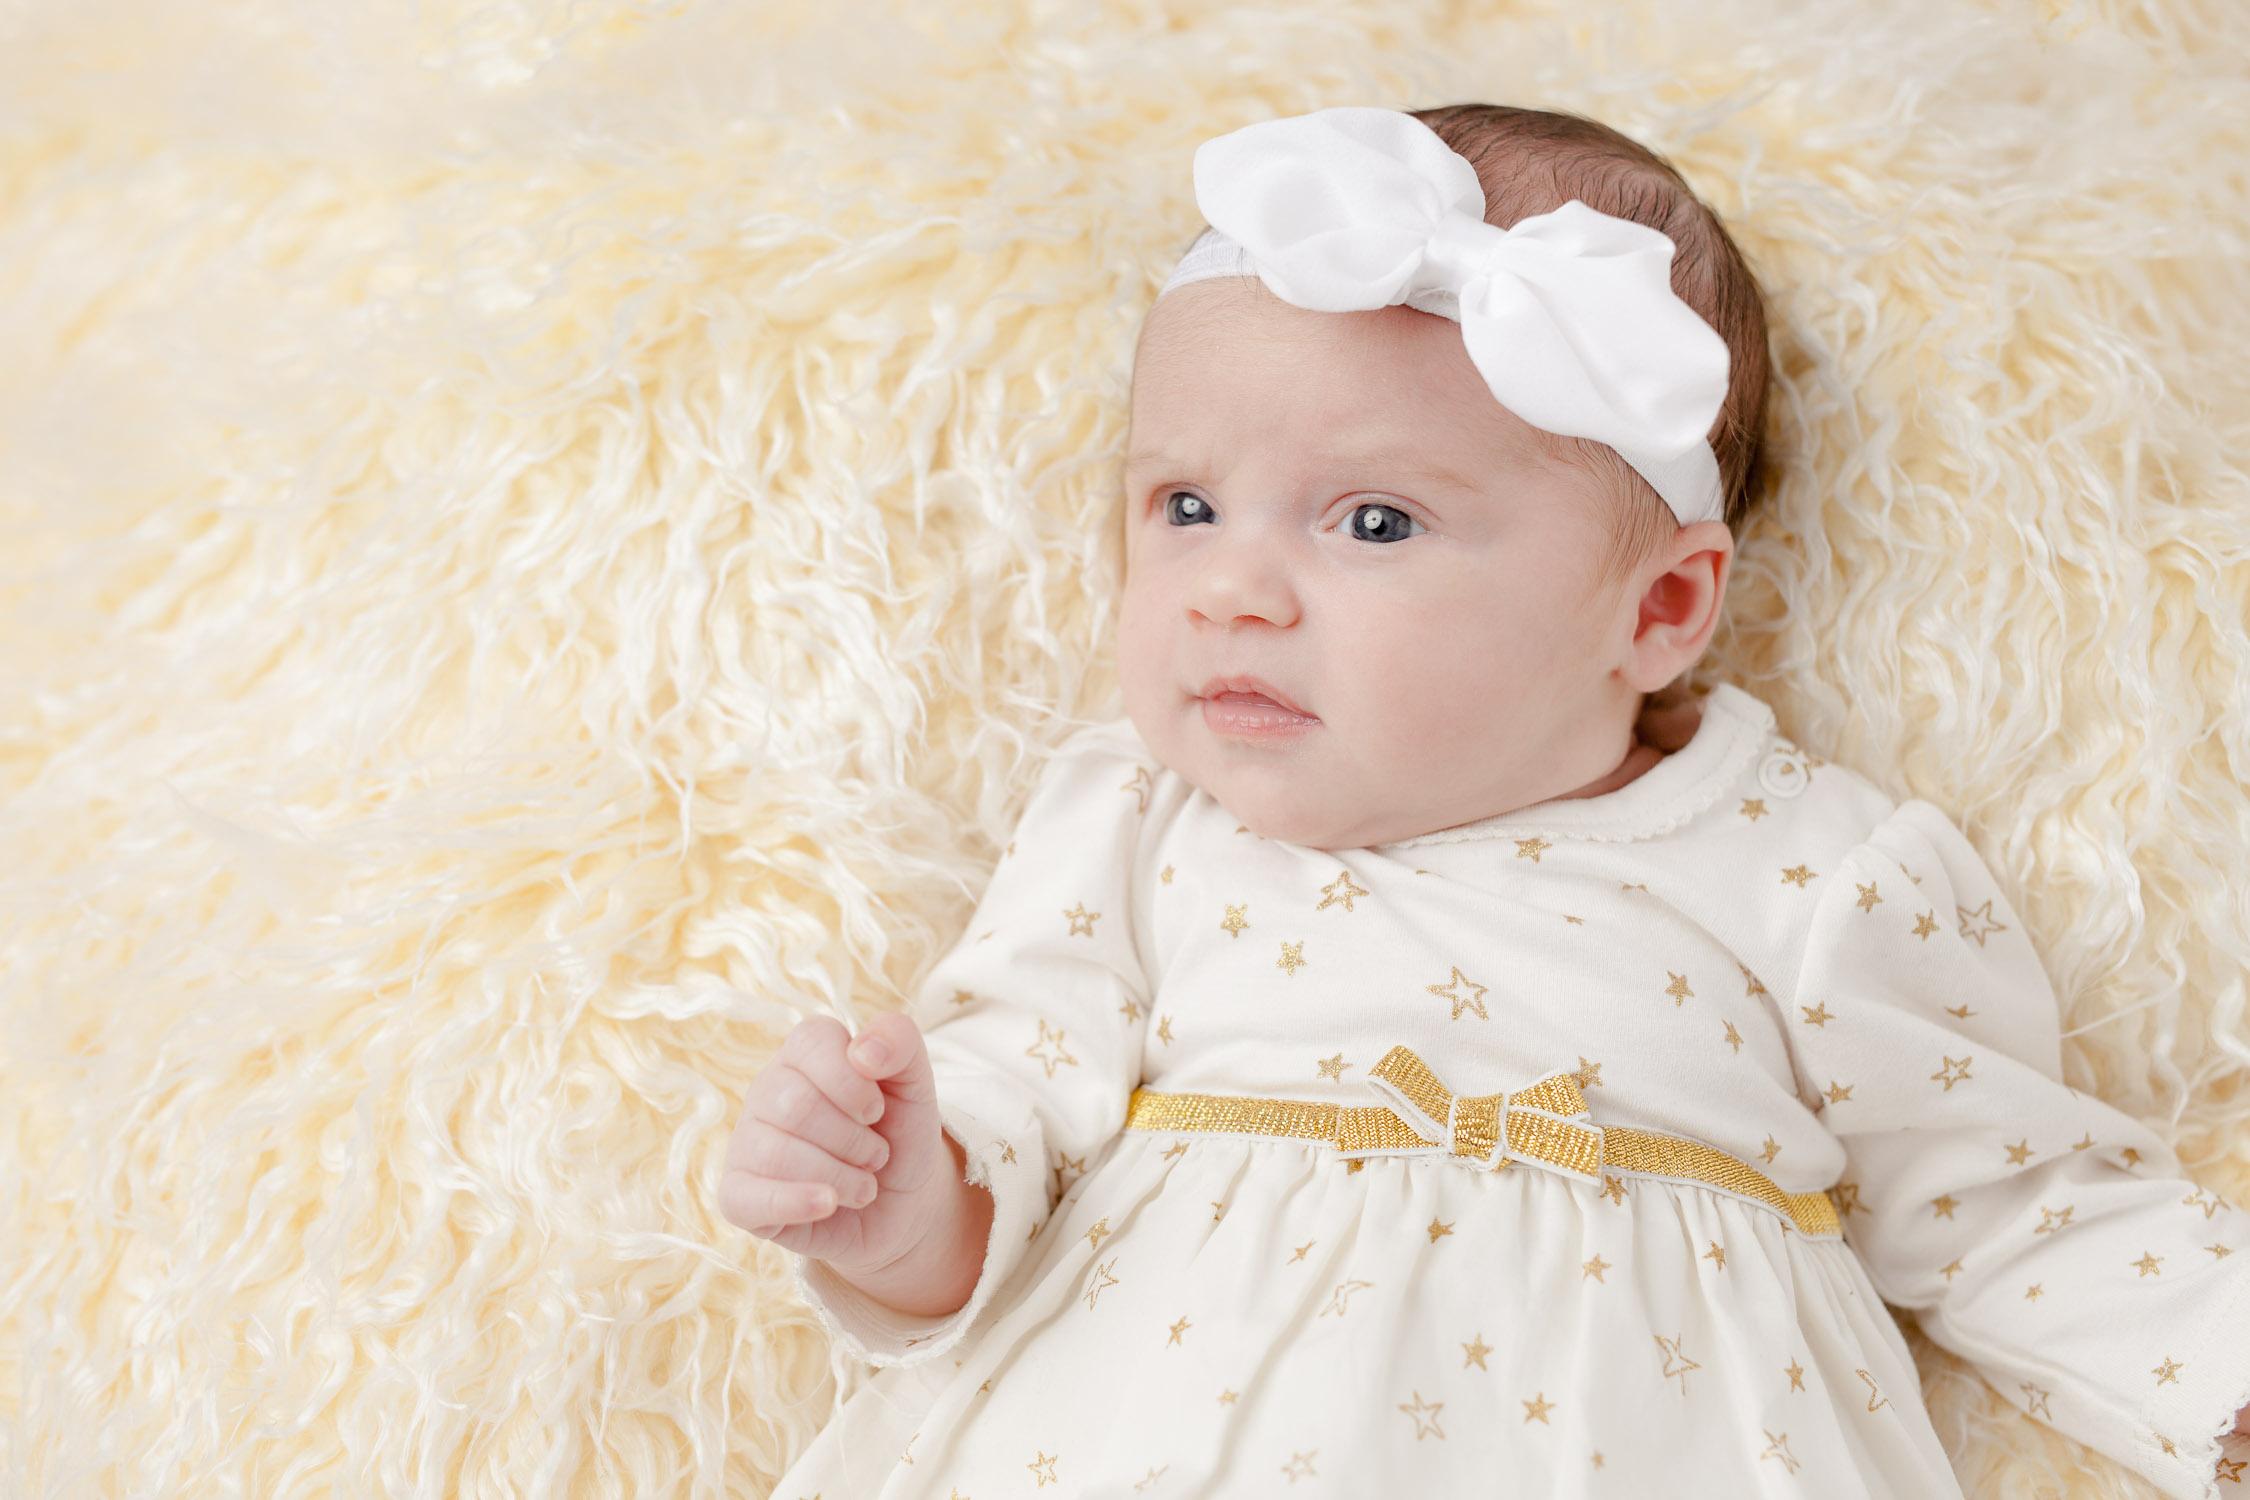 baby-babyfotograf-babyfotografering-fotograf-hodnedesign-pål-hodne--17.jpg